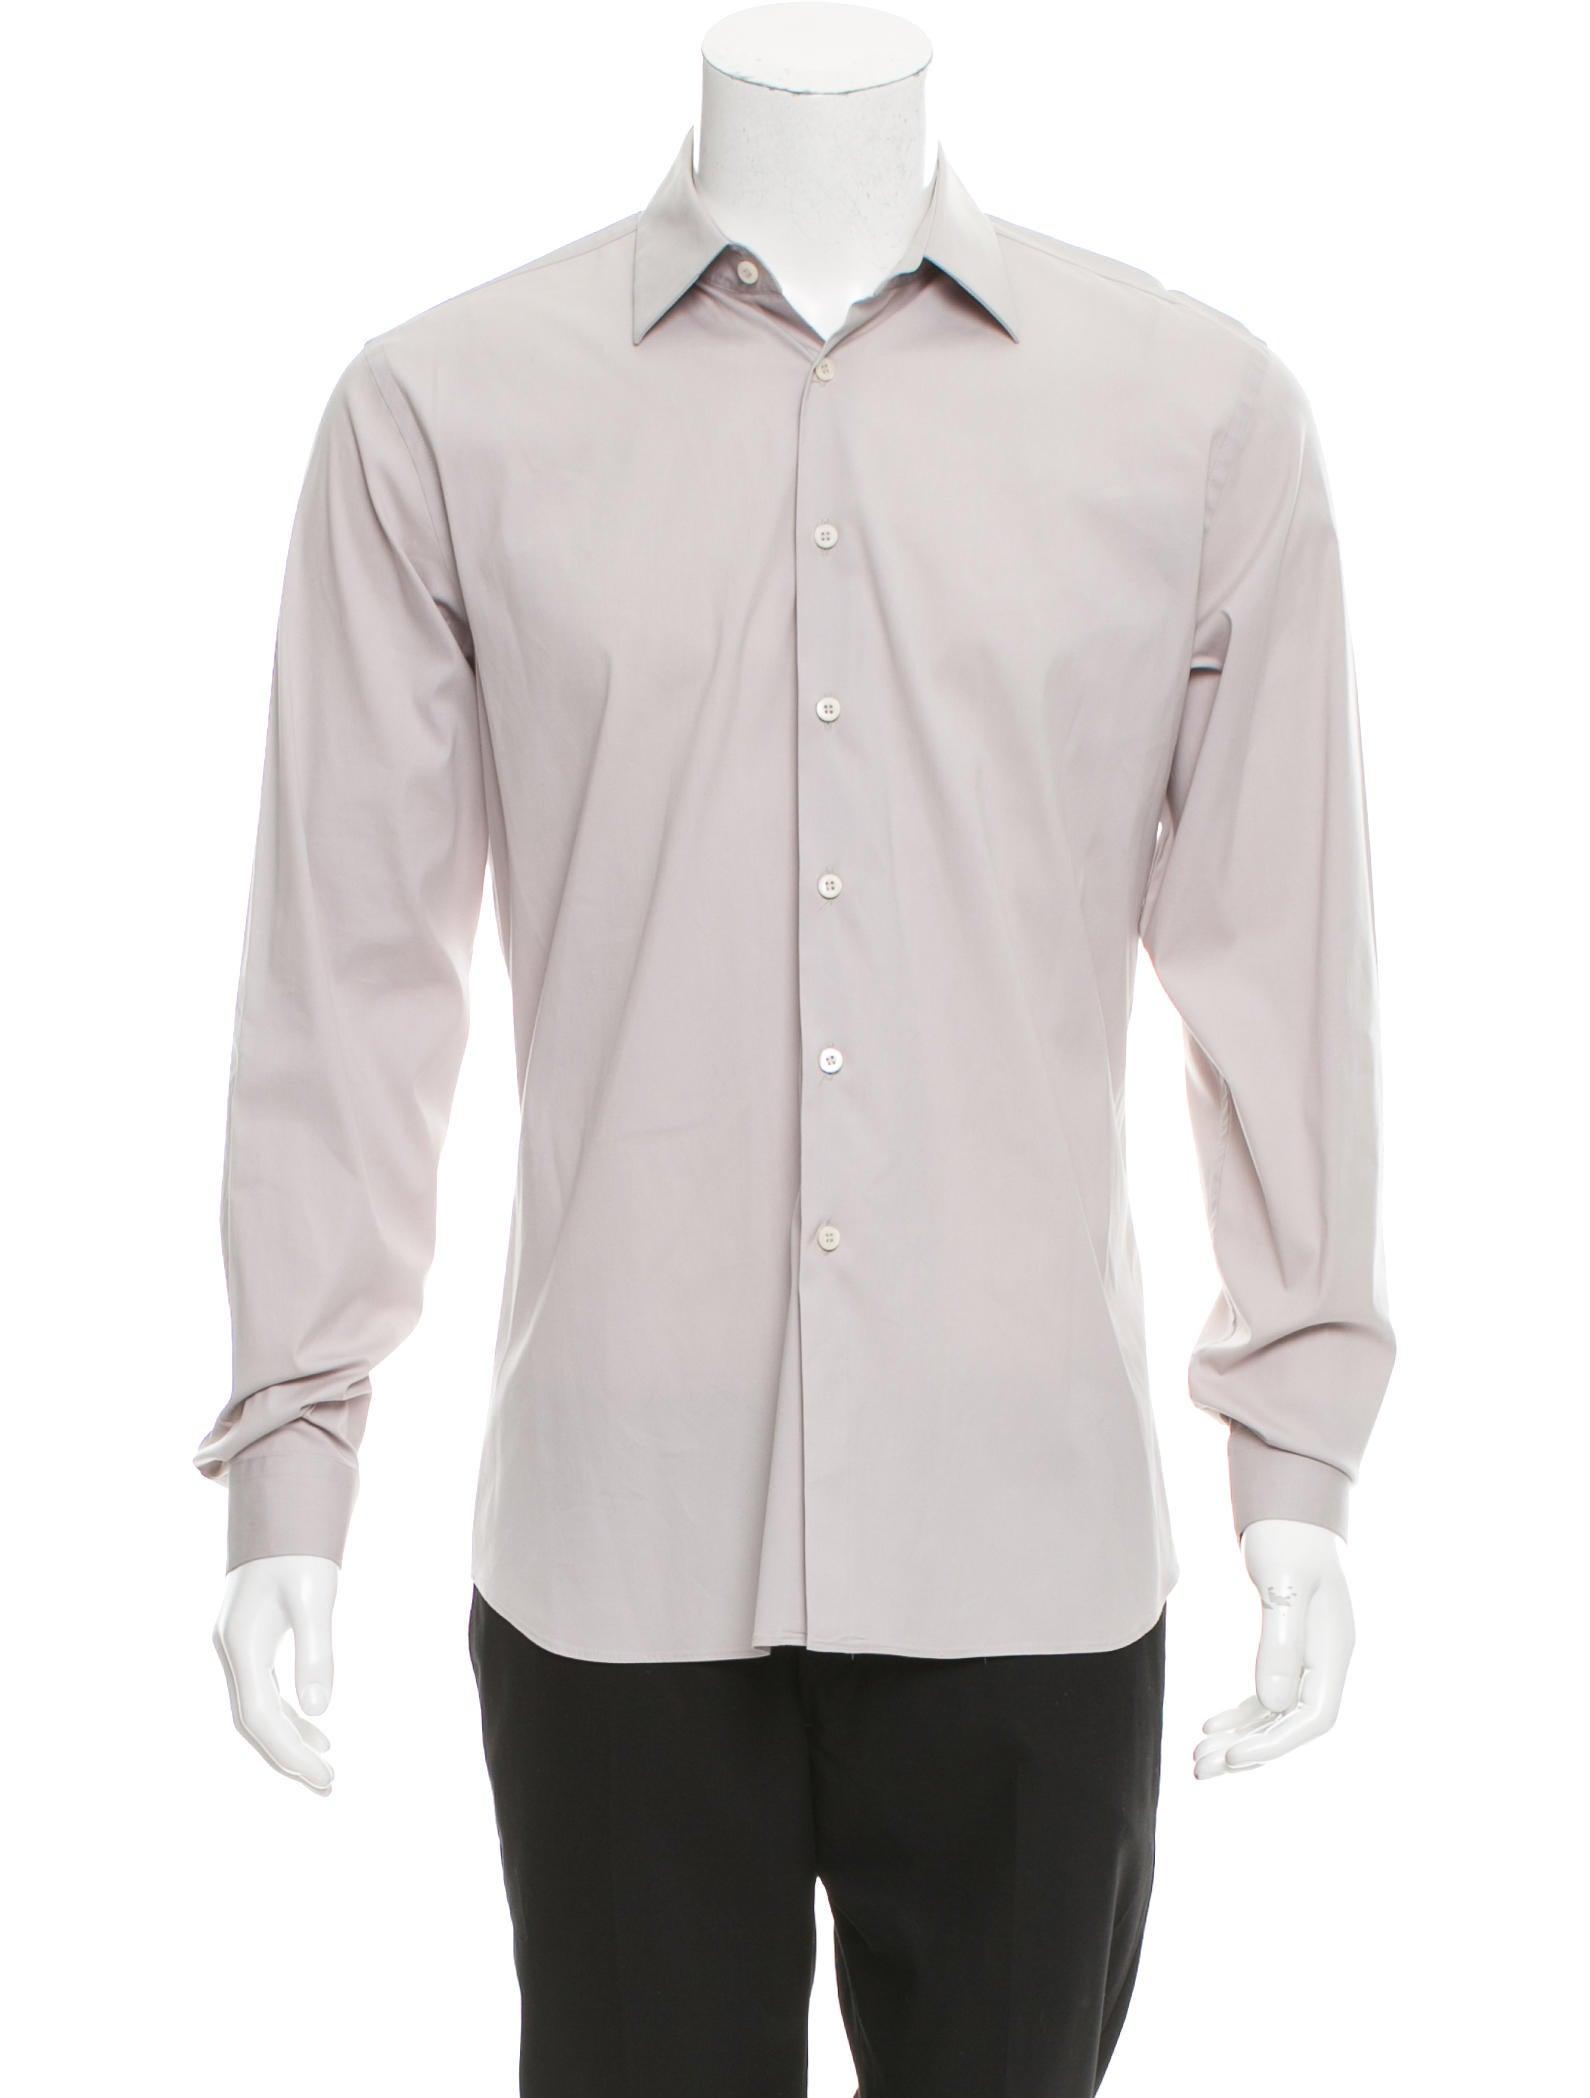 Prada Long Sleeve Button Up Shirt Clothing Pra164266